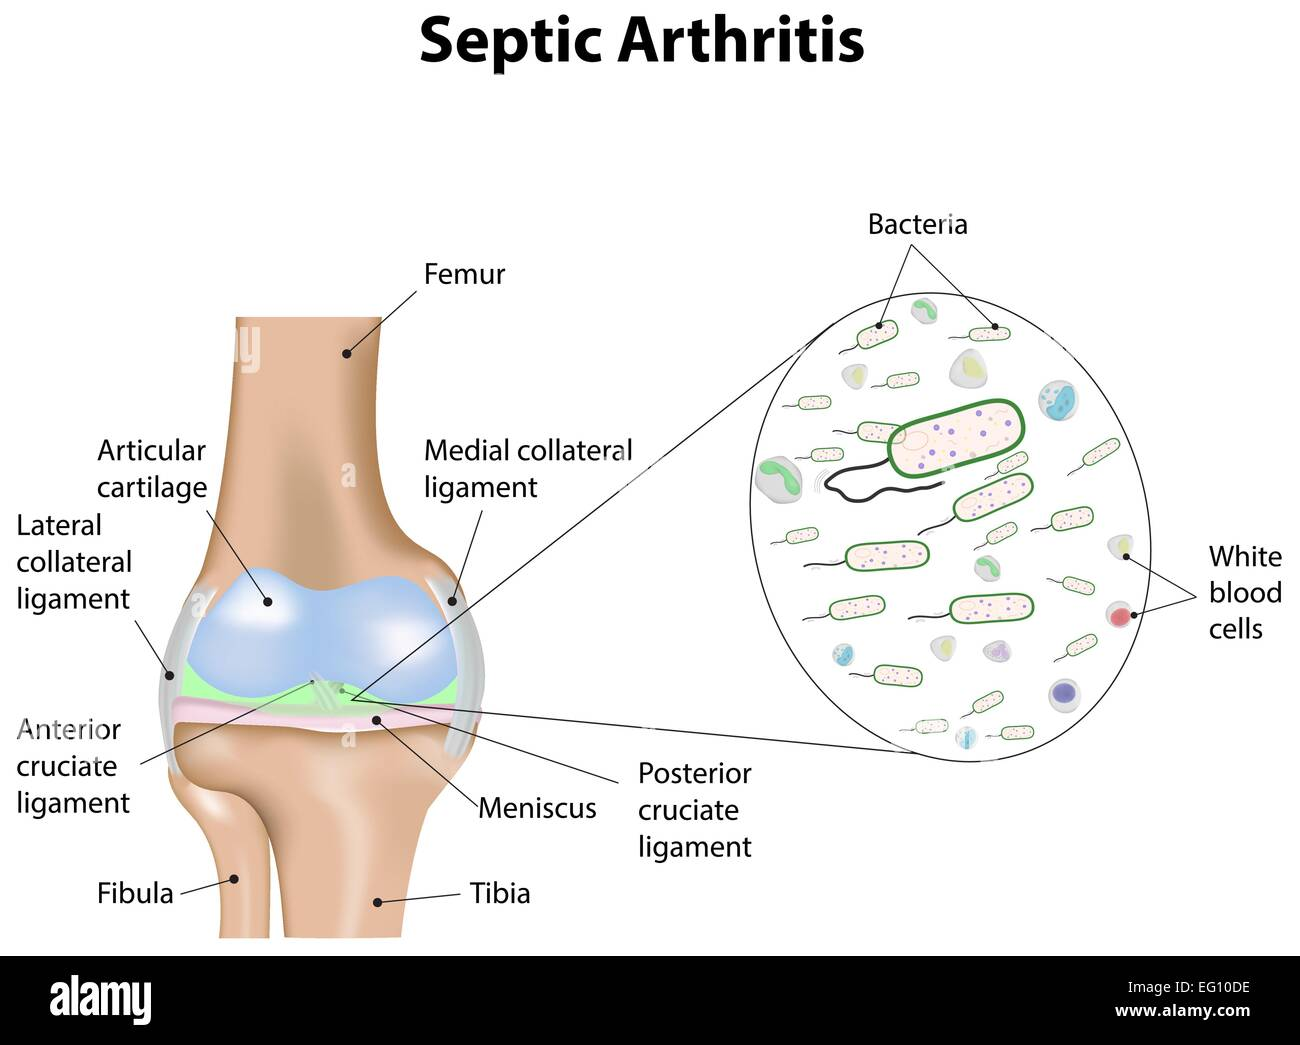 Septic Arthritis - Stock Image